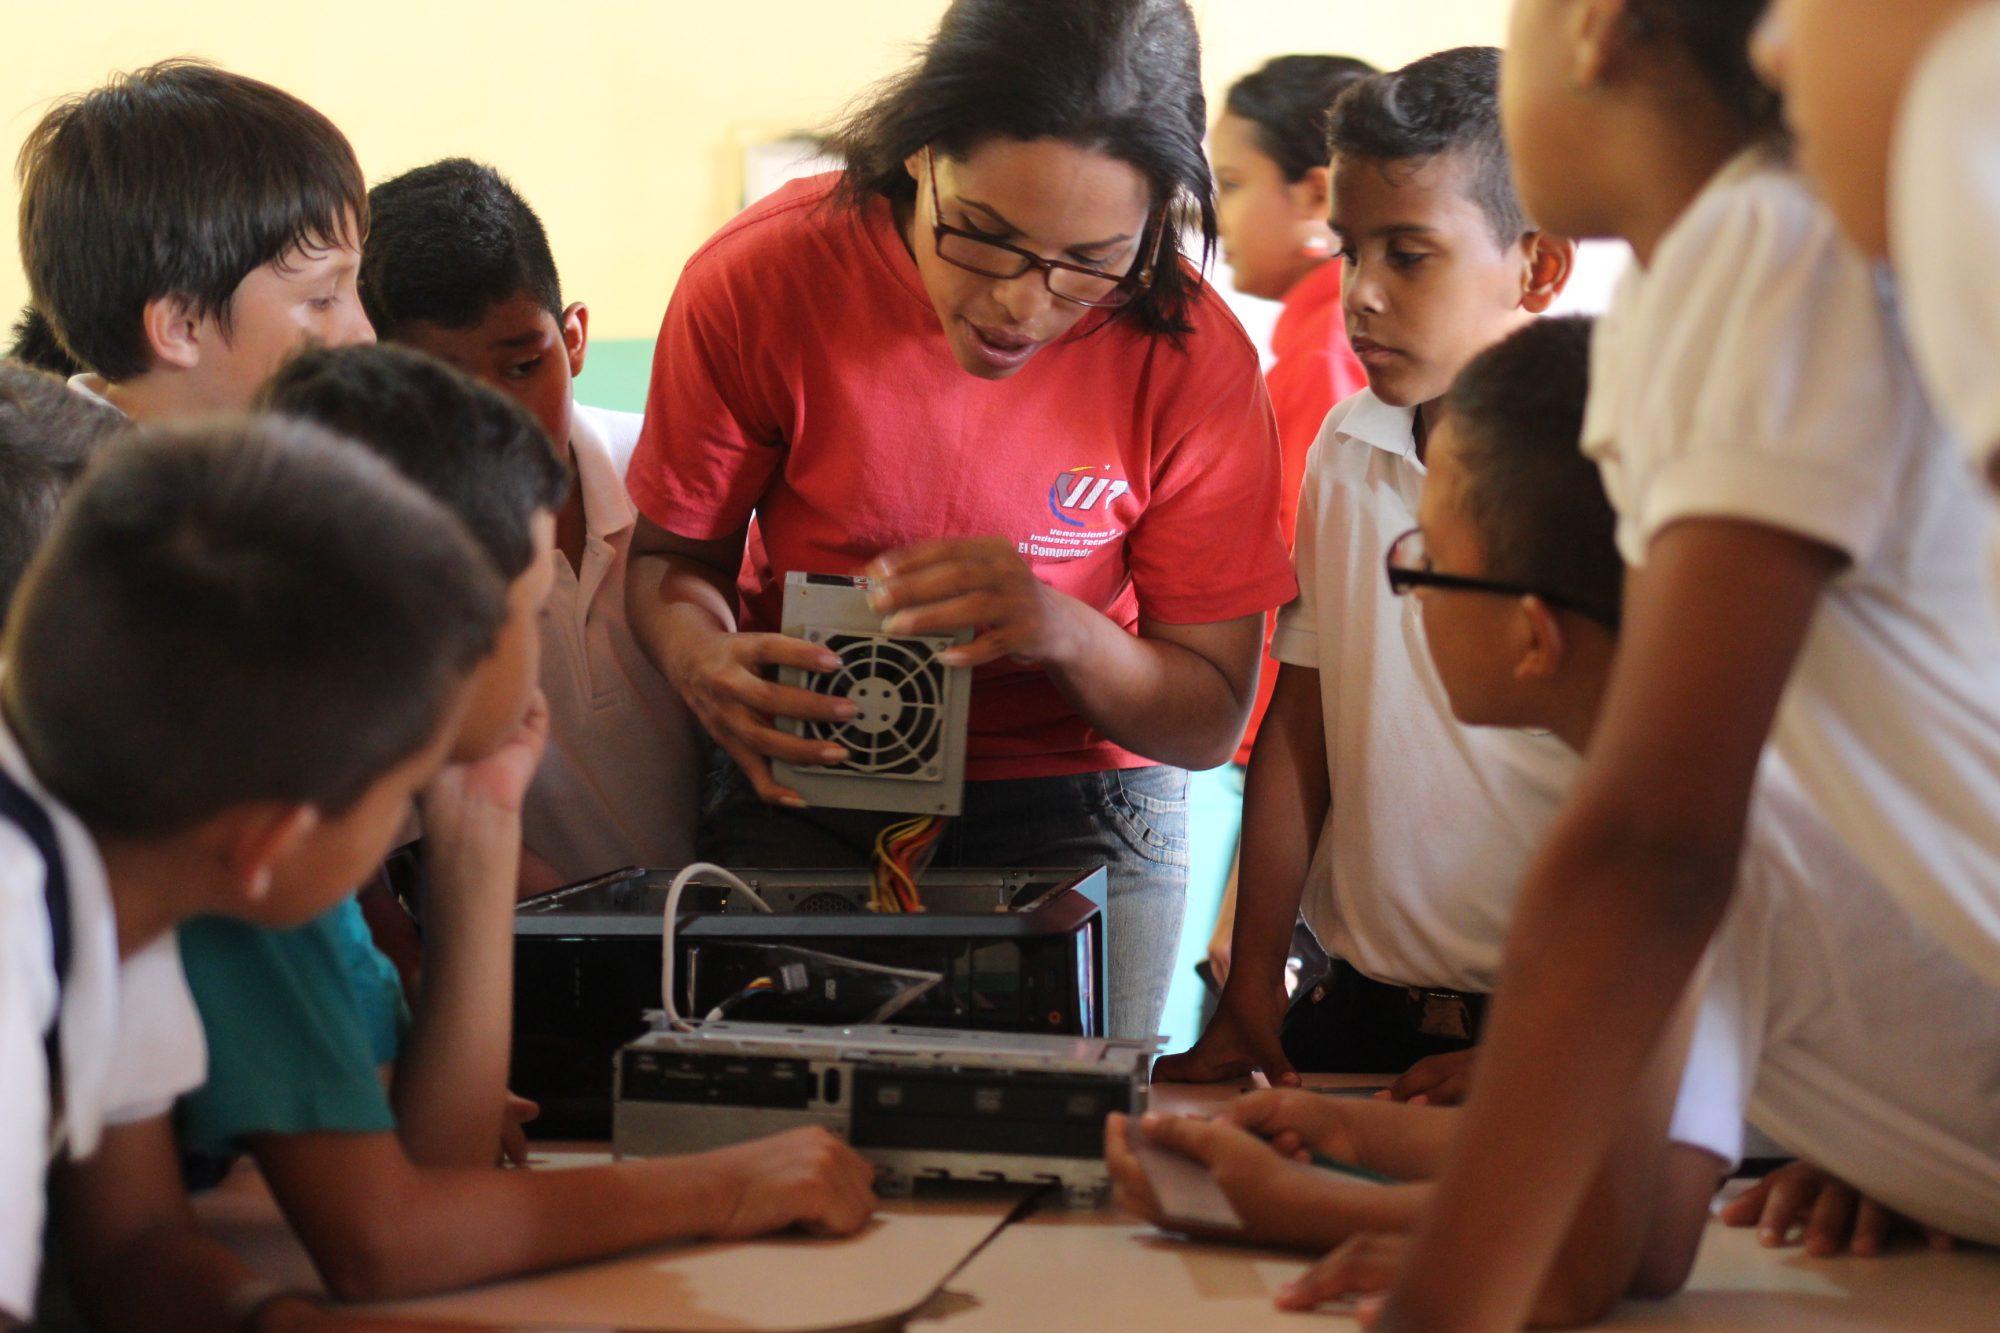 Tecnología Educativa se despliega en la E.B Alicia Tremont de Medina